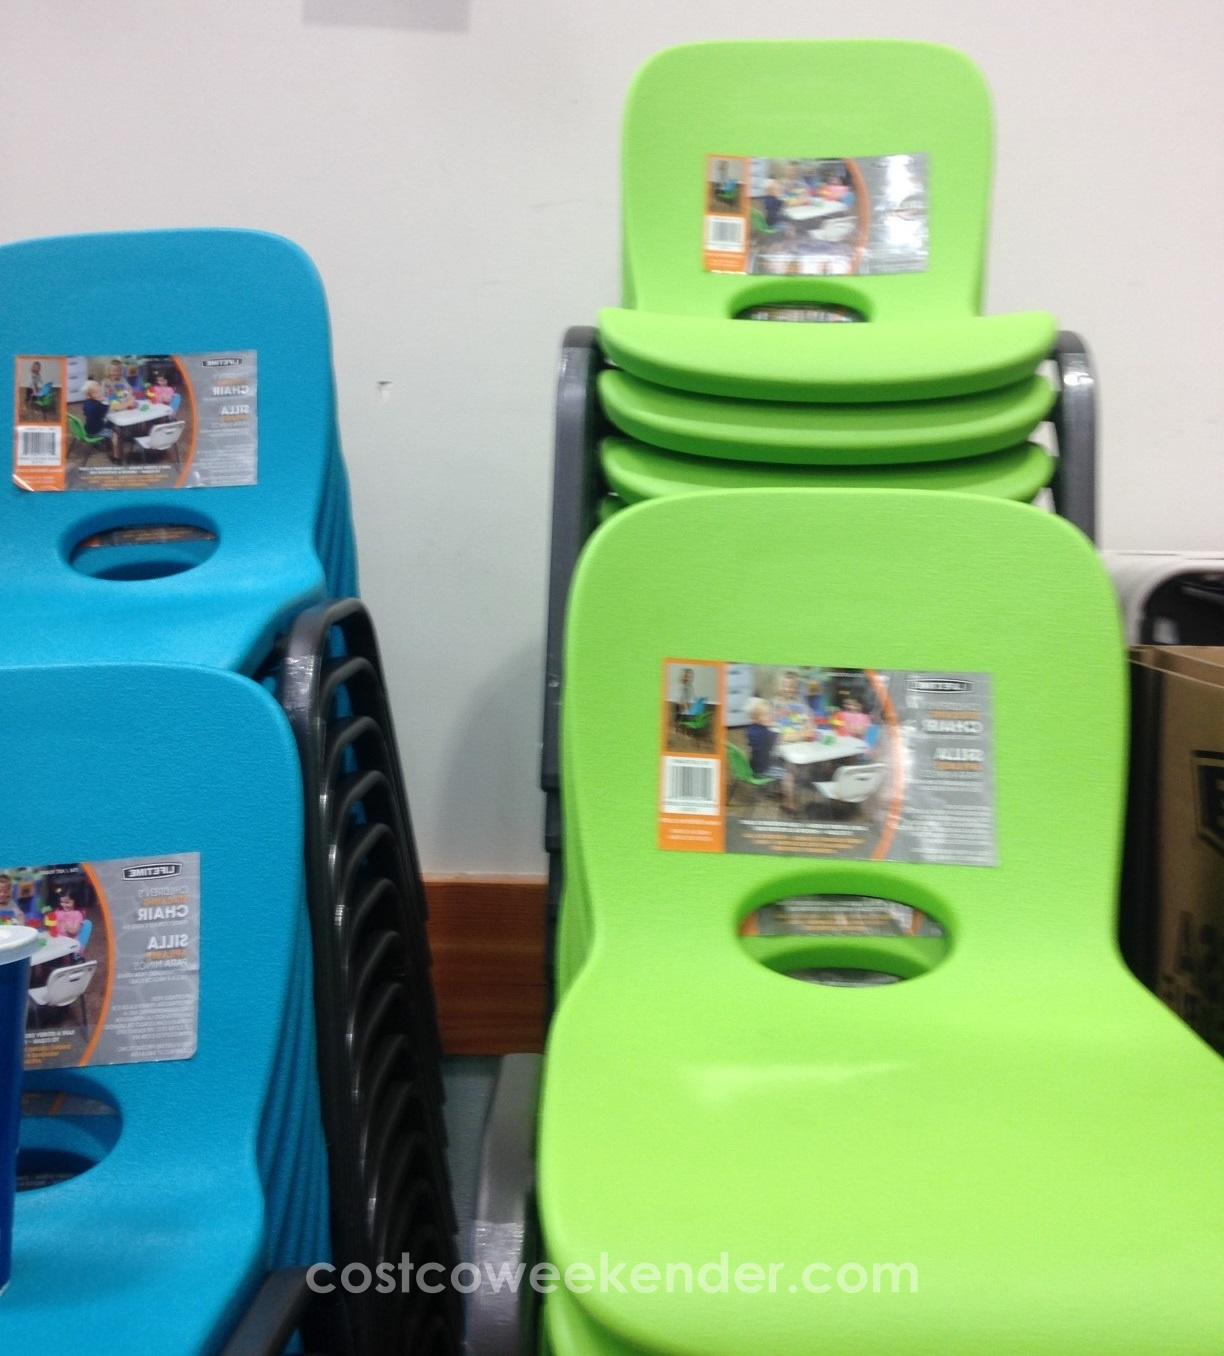 Lifetime Children's Stacking Chair | Costco Weekender